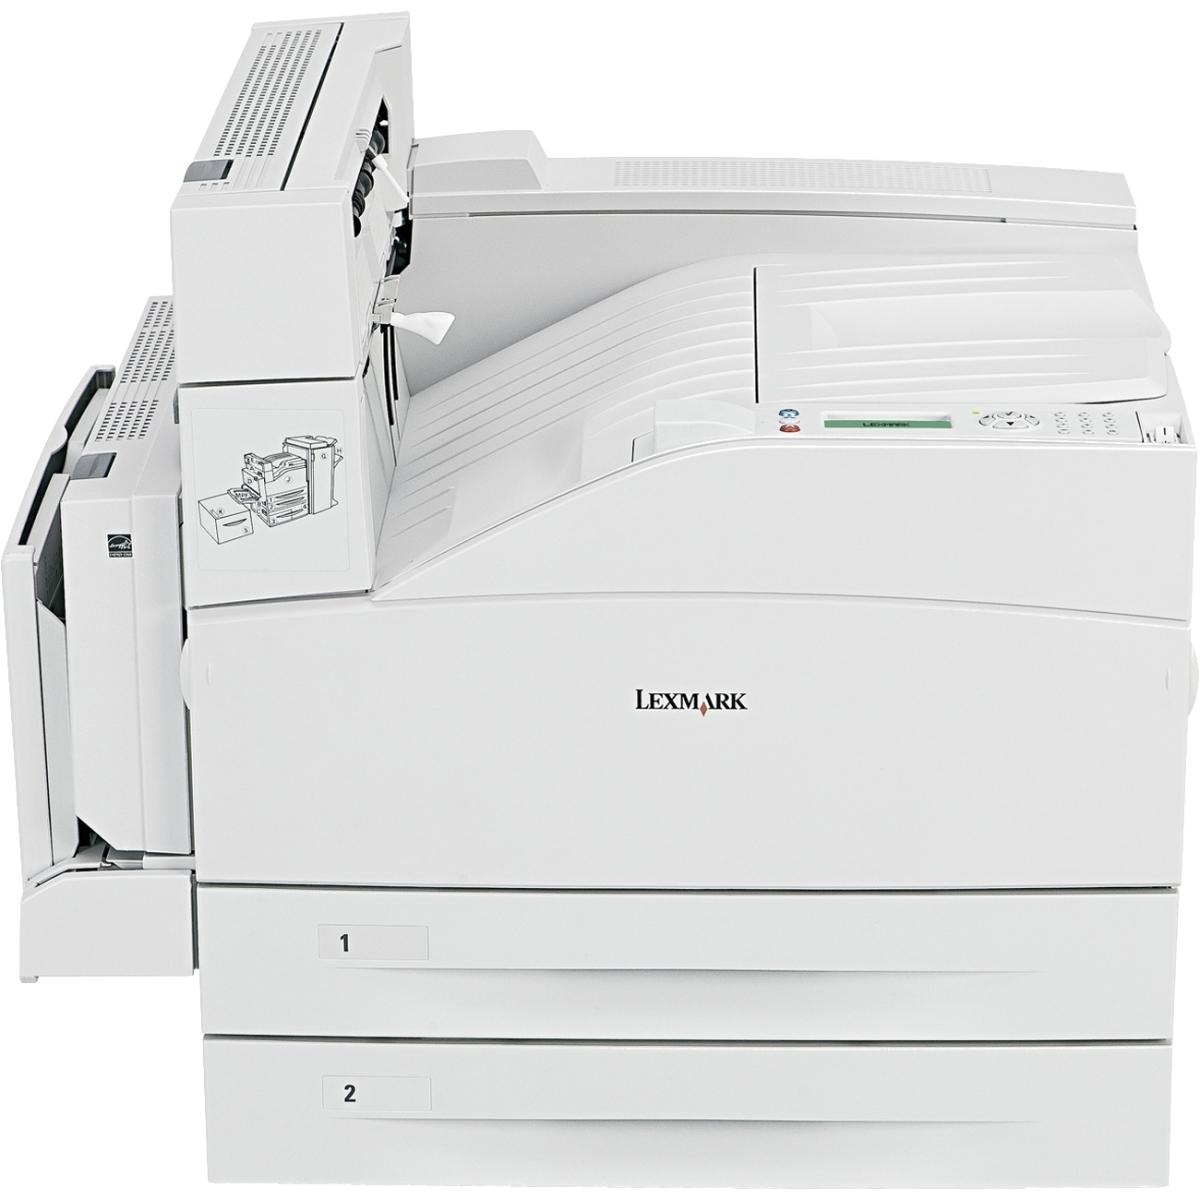 W850DN Laser Printer - Monochrome - 1200 x 1200 dpi Print - Plain Paper Print - Desktop - 50 ppm Mono Print - 1100 sheets Input - Automatic Duplex Print - Gigabit Ethernet - USB